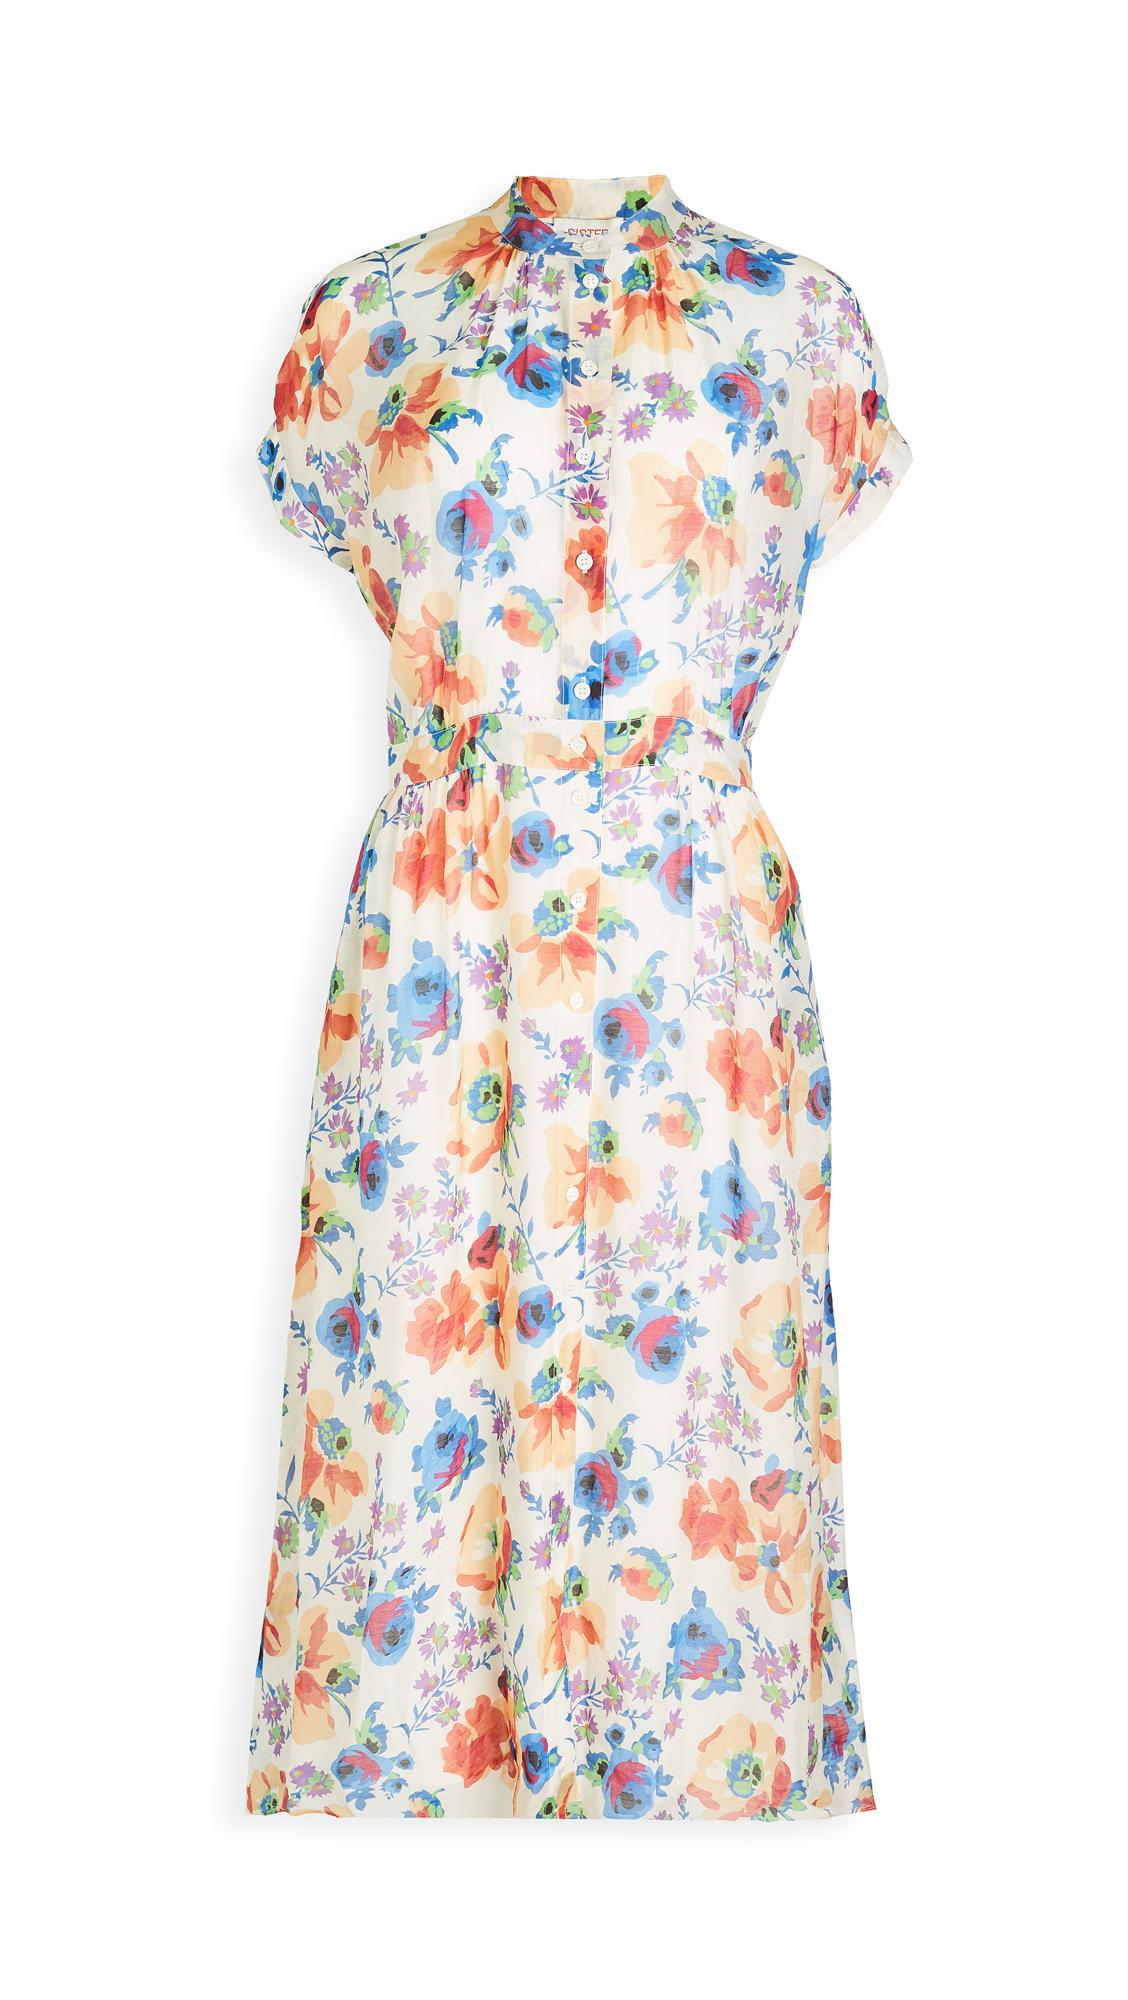 Paul & Joe Sister Tholonia Dress - 30% Off Sale